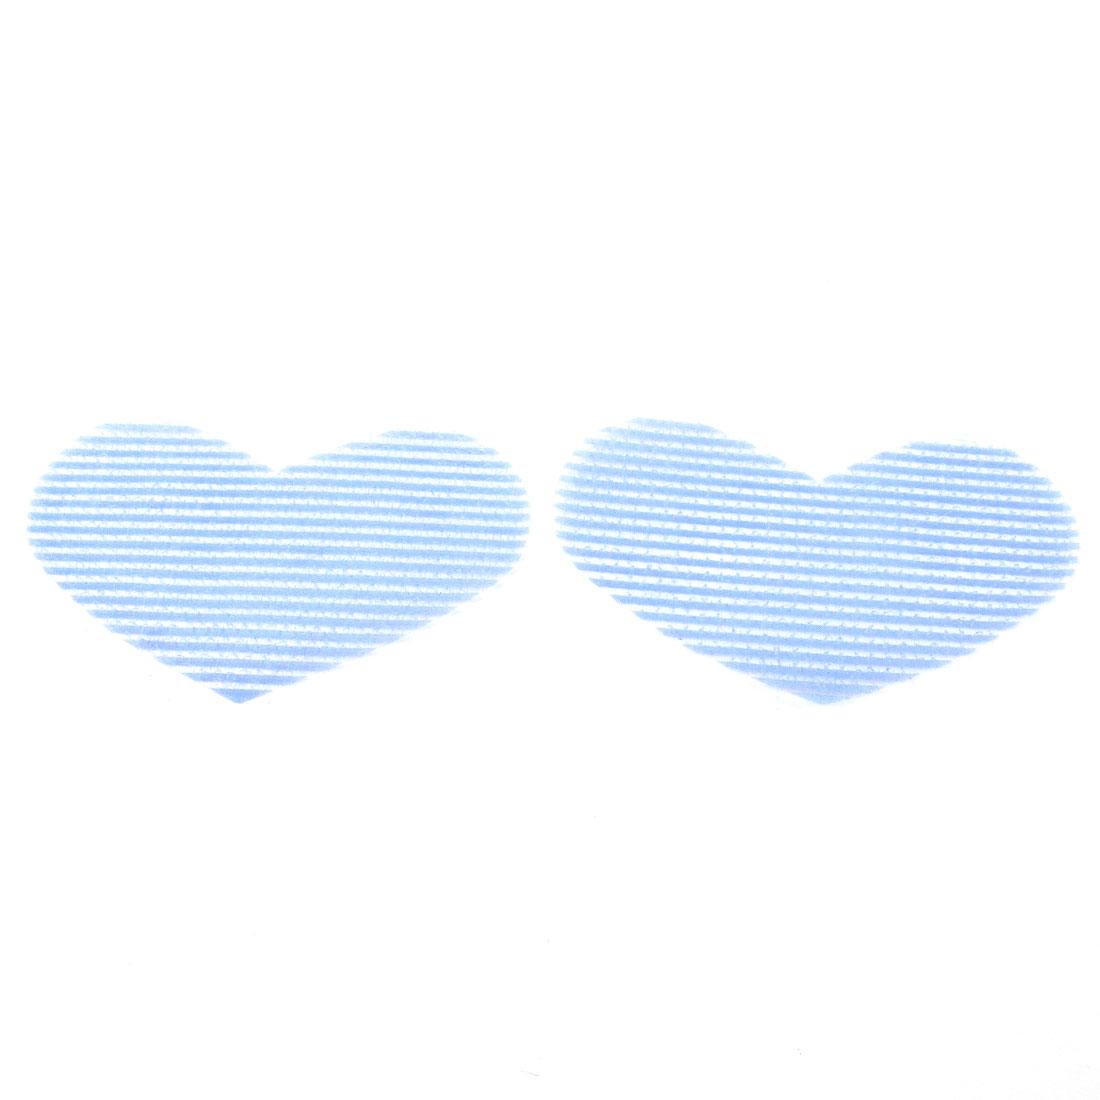 Light Blue Heart Designed Make Up Foretop Hair Bangs Magic Sheet 2 Pcs